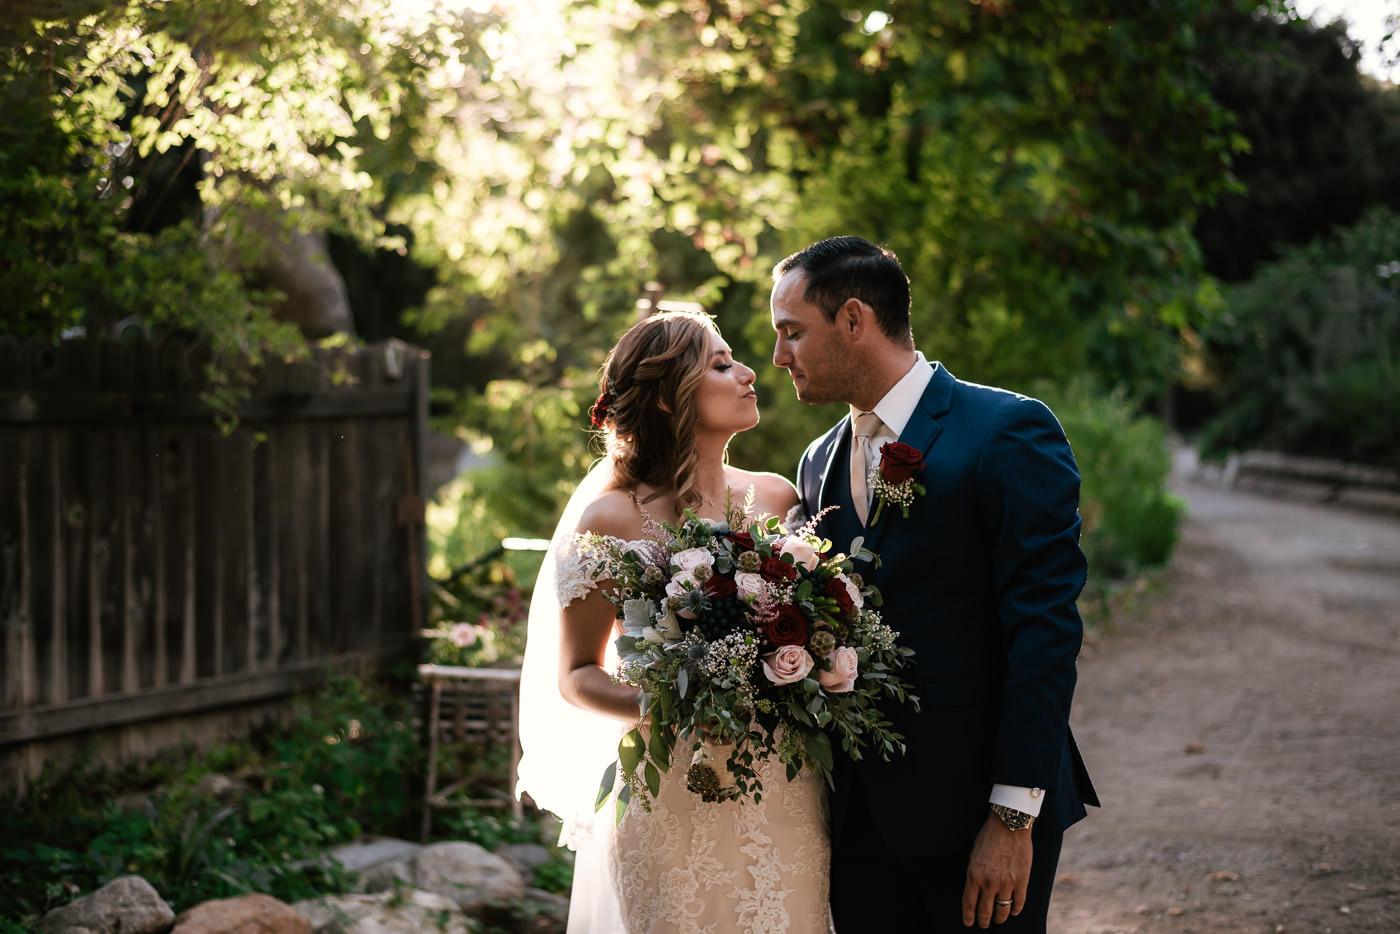 Wedding photographers near The Homestead at Wilshire Ranch in Oak Glenn.